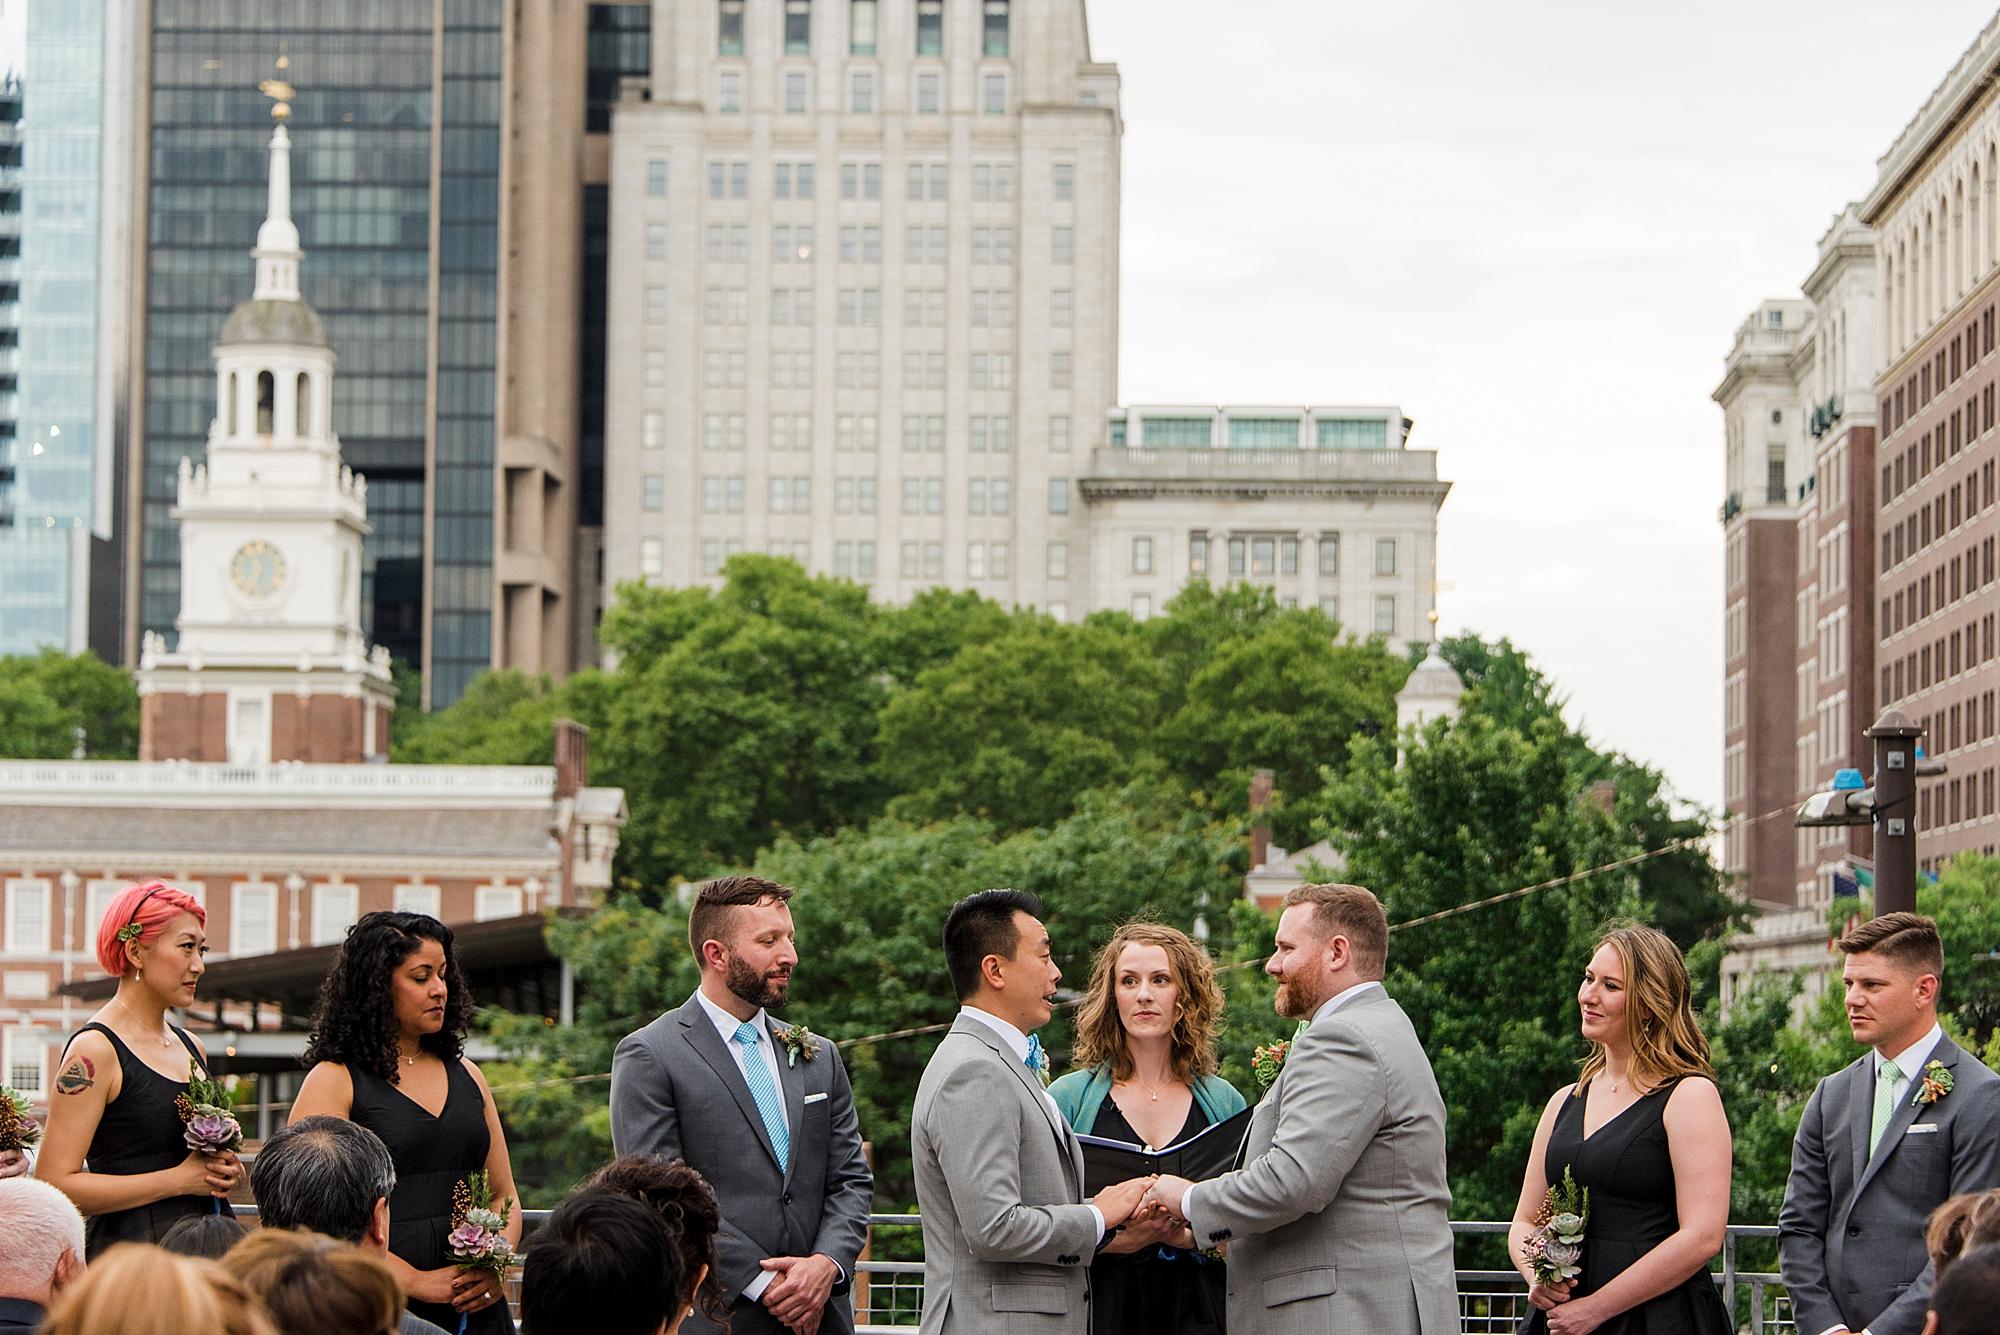 Dan_and_Byron_Love_by_Joe_Mac_Philadelphia_Wedding_LGBTQ_Photography_Gay_Independence_visitor_Center_100.JPG